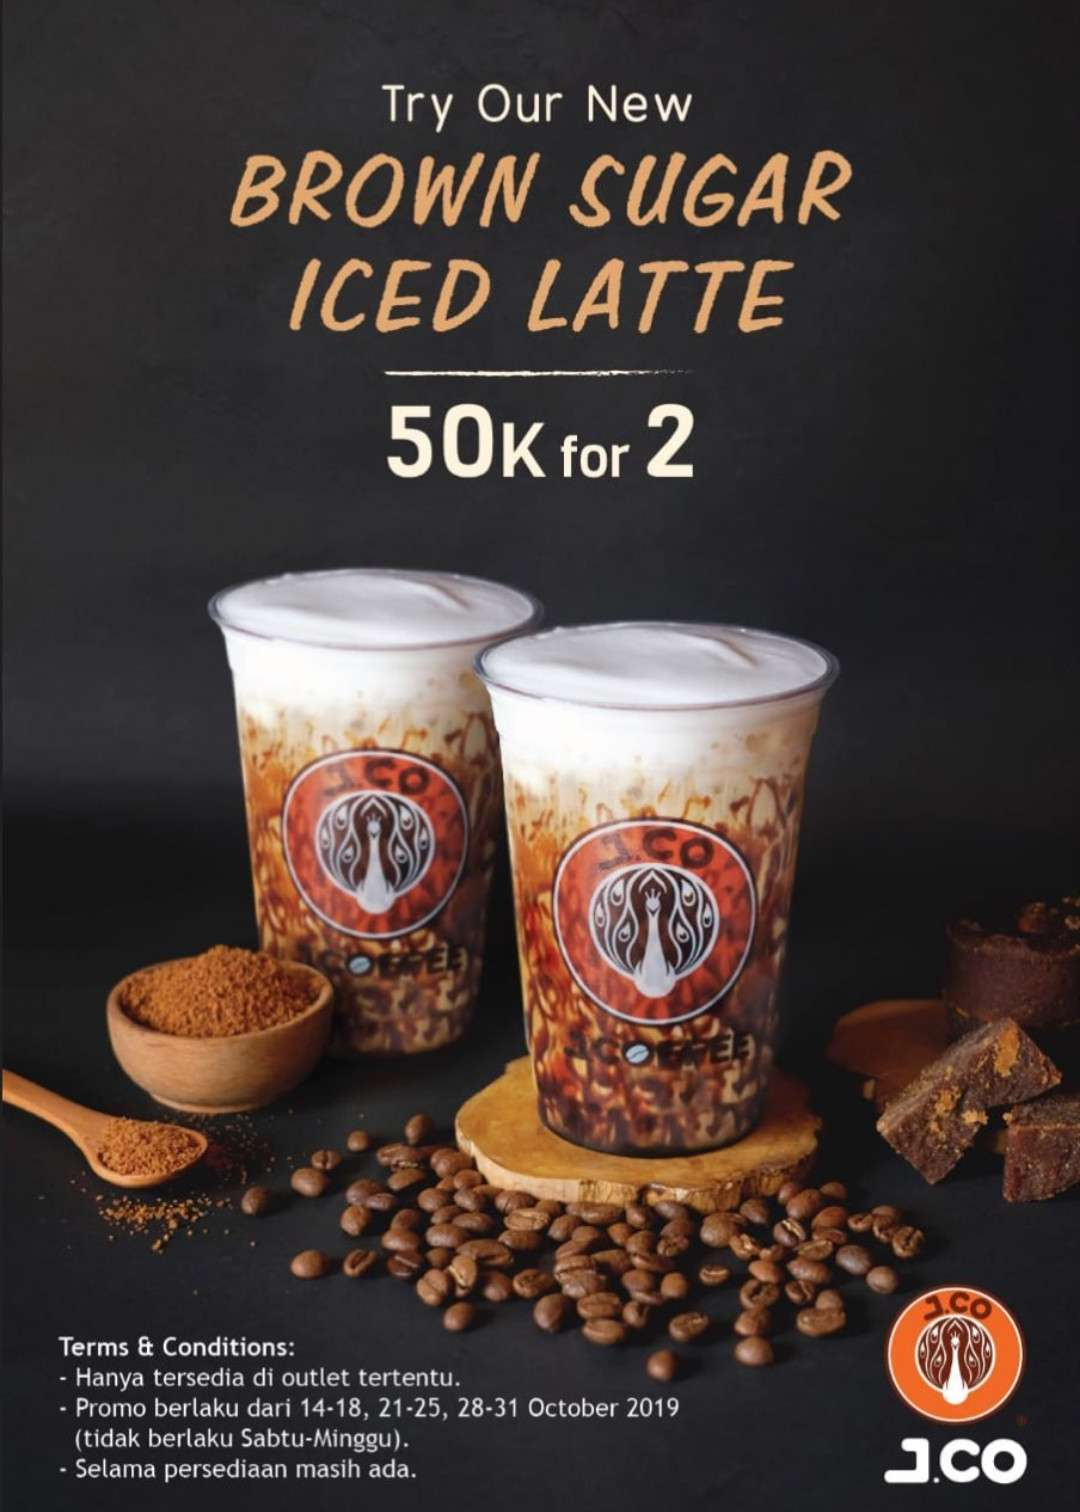 Jco New Brown Sugar Iced Latte Harga Spesial Rp. 50.000 untuk 2 Cup